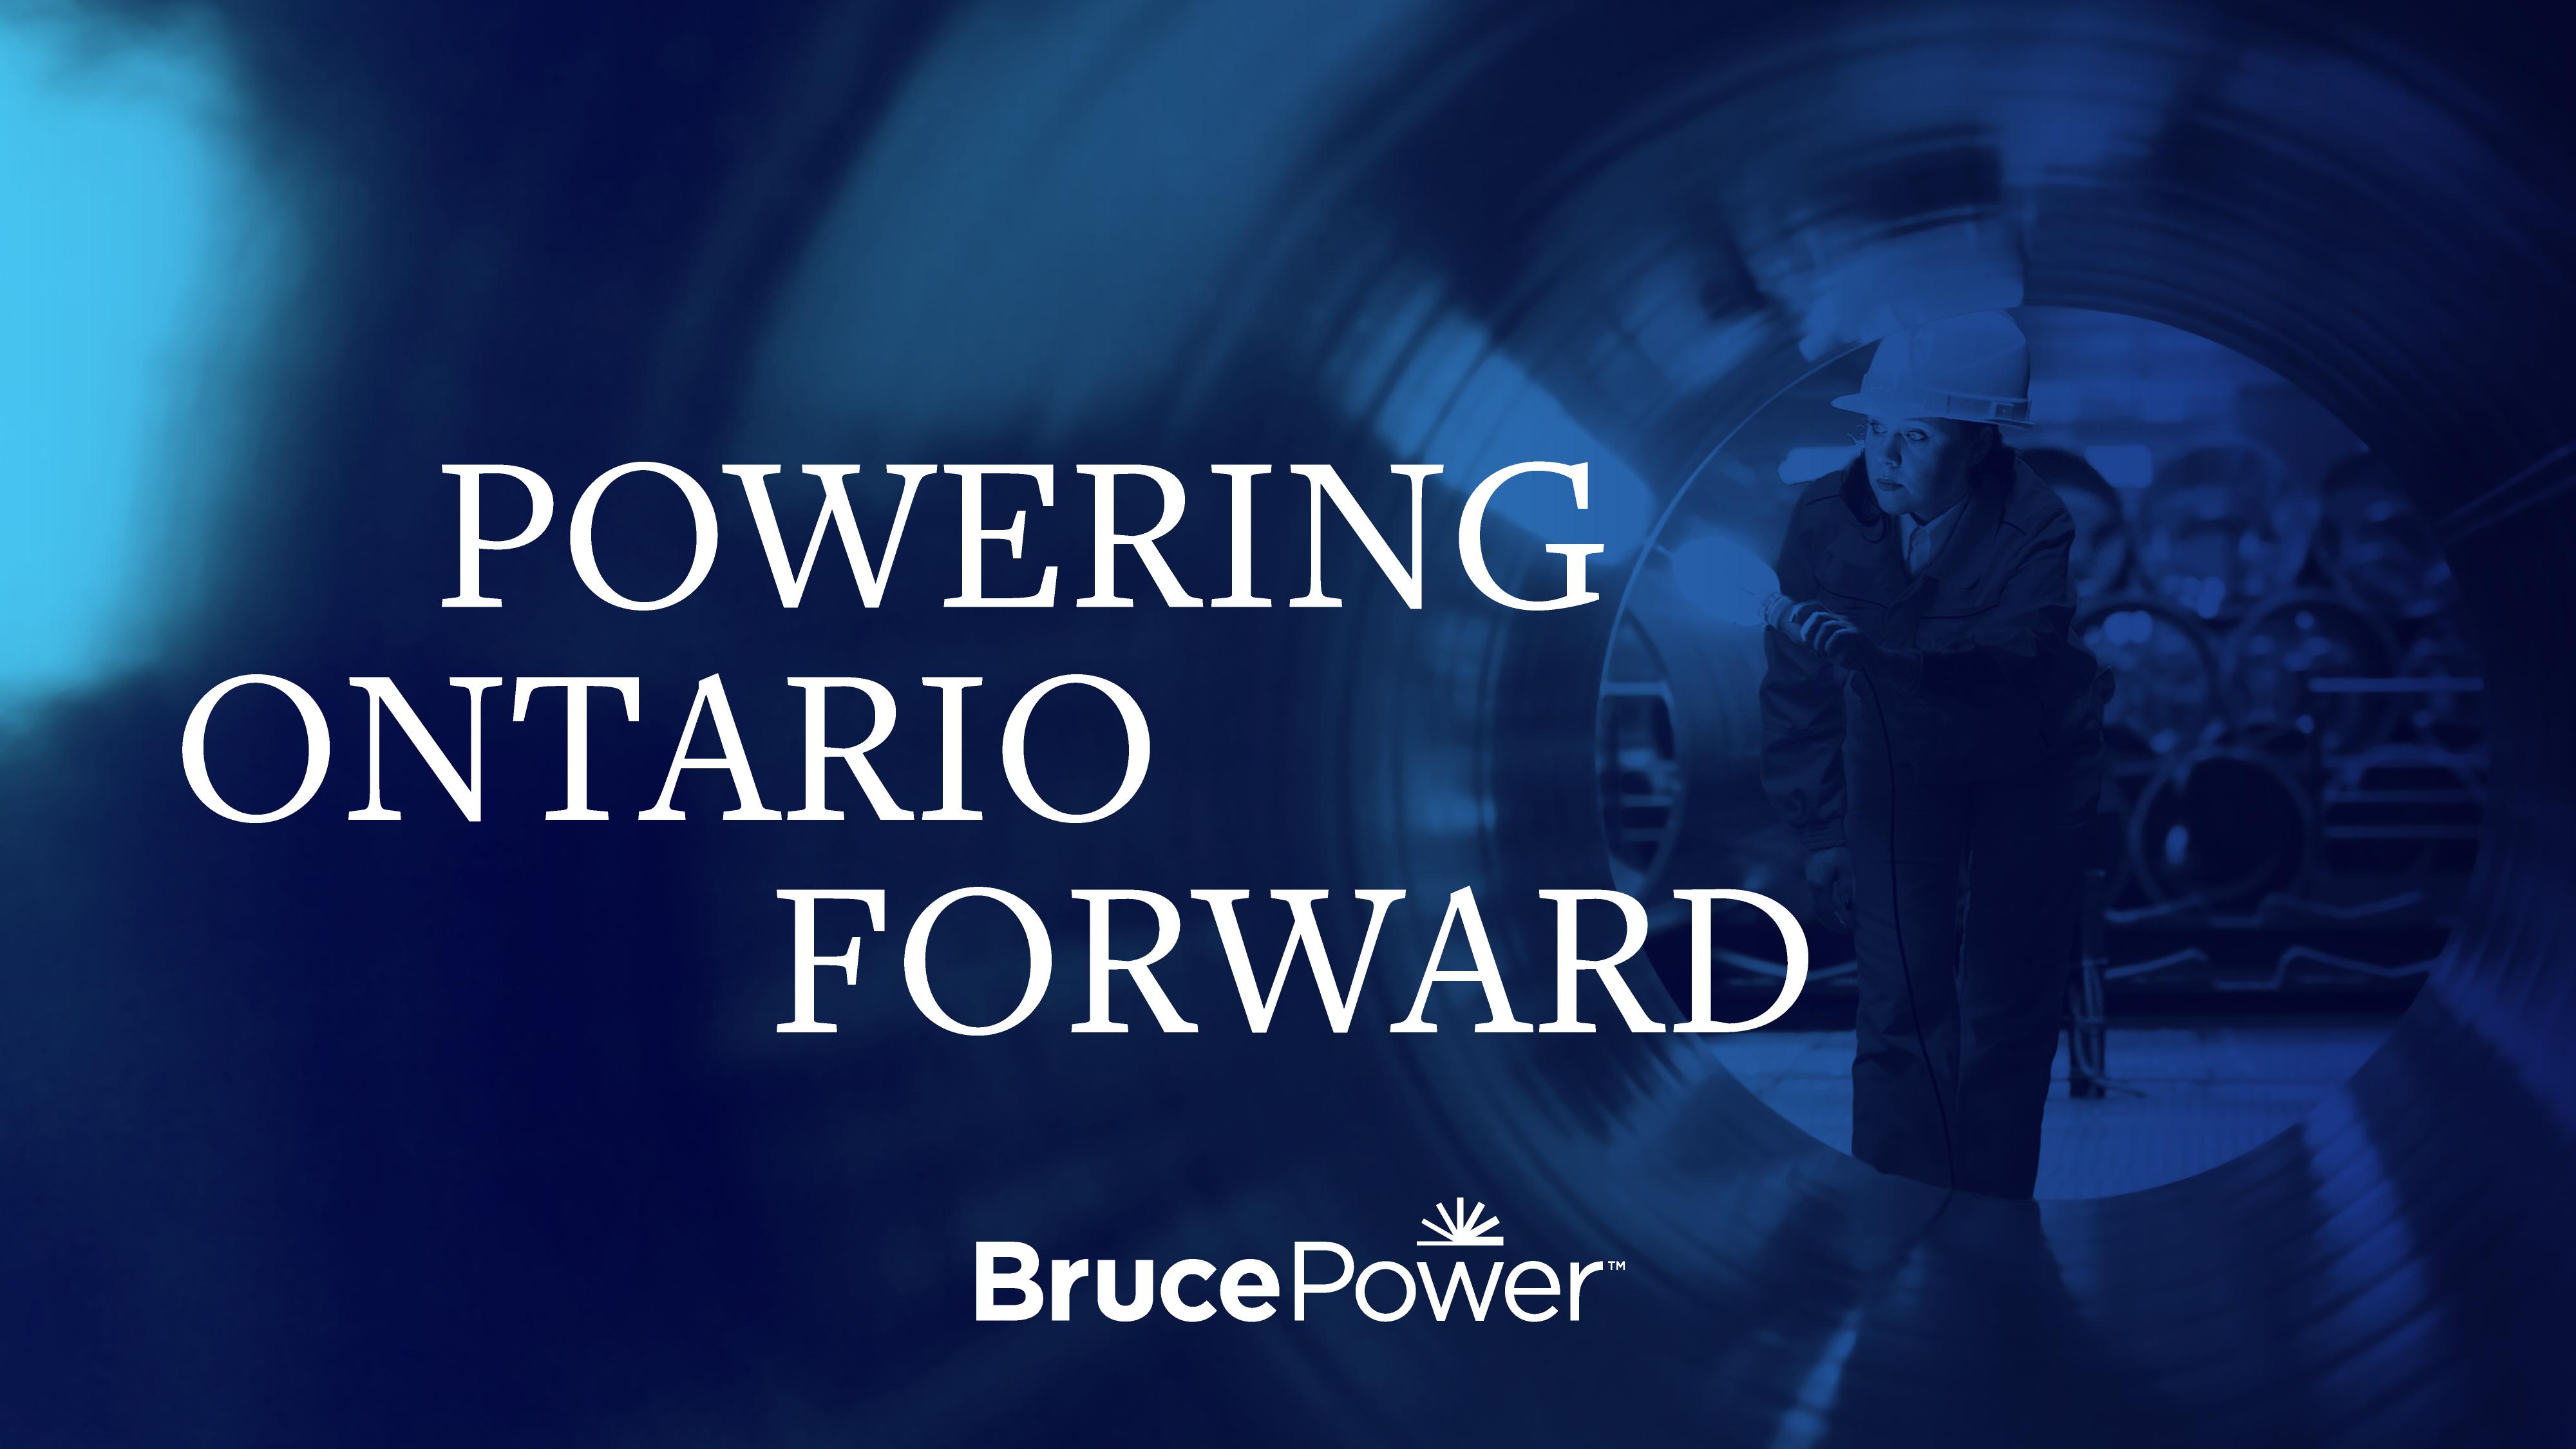 Powering Ontario Forward